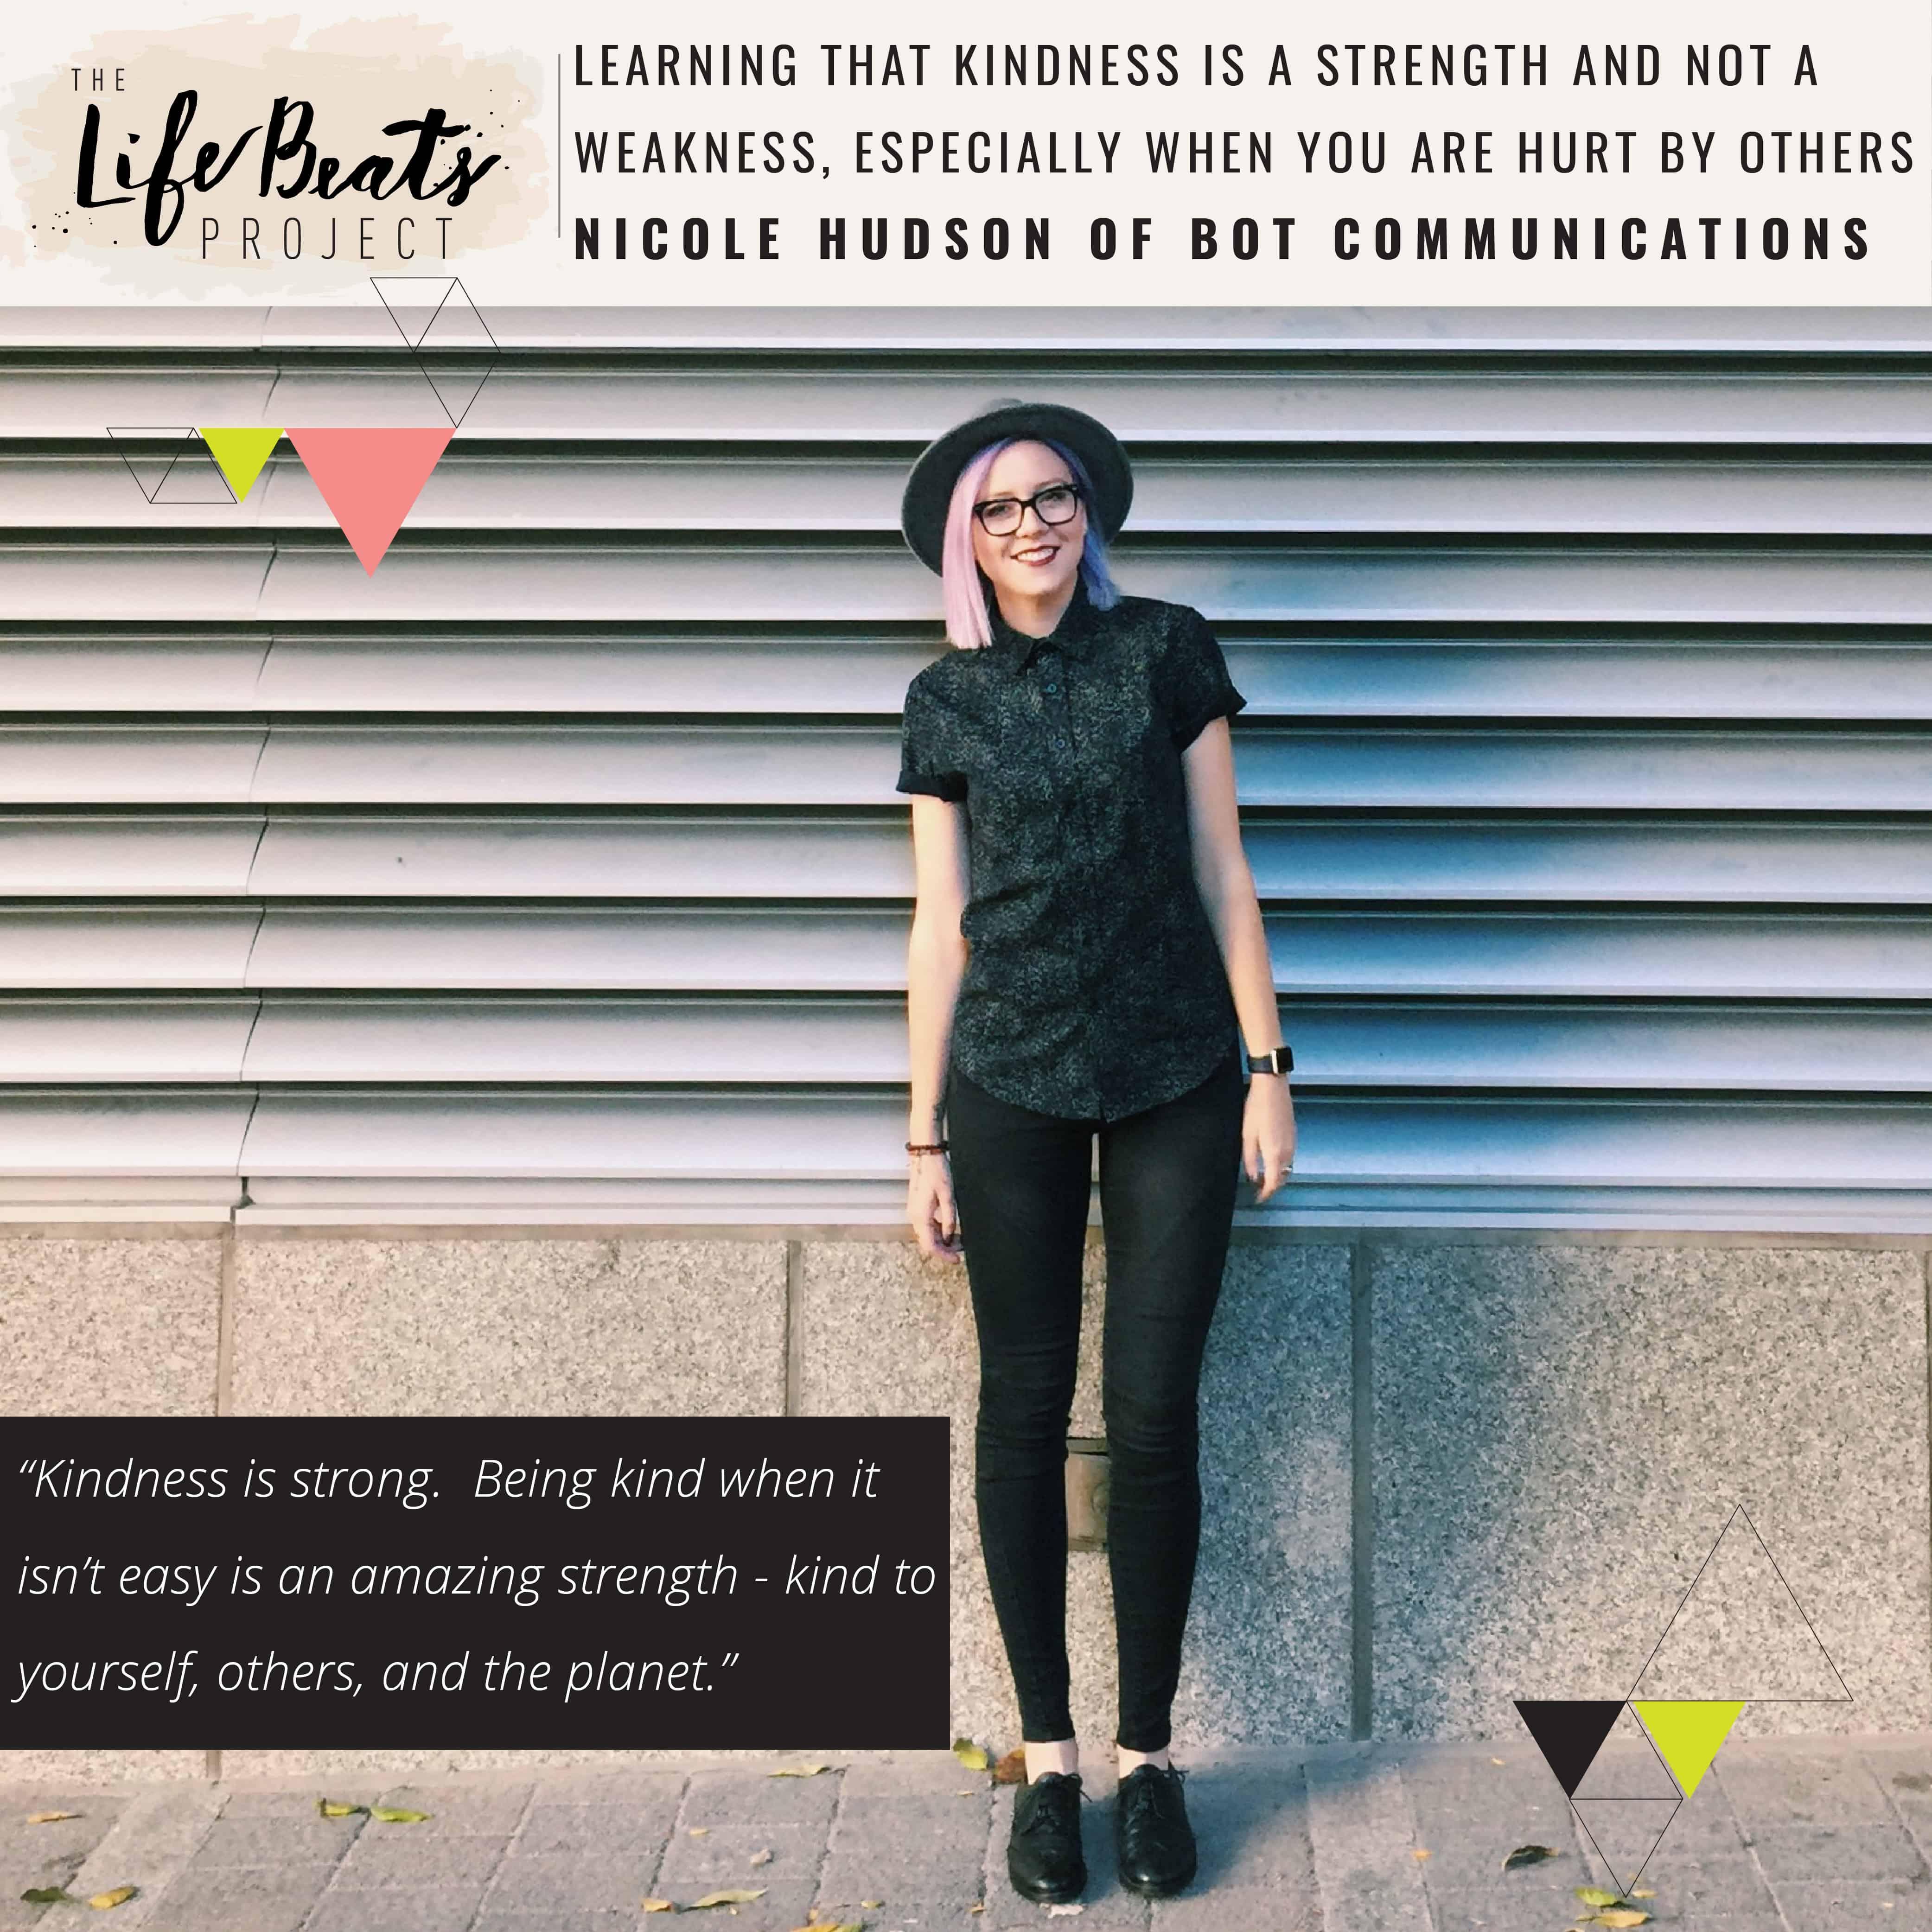 kind kindness hurt affair divorce Nicole Hudson LifeBeats Project Canada entrepreneur workshop